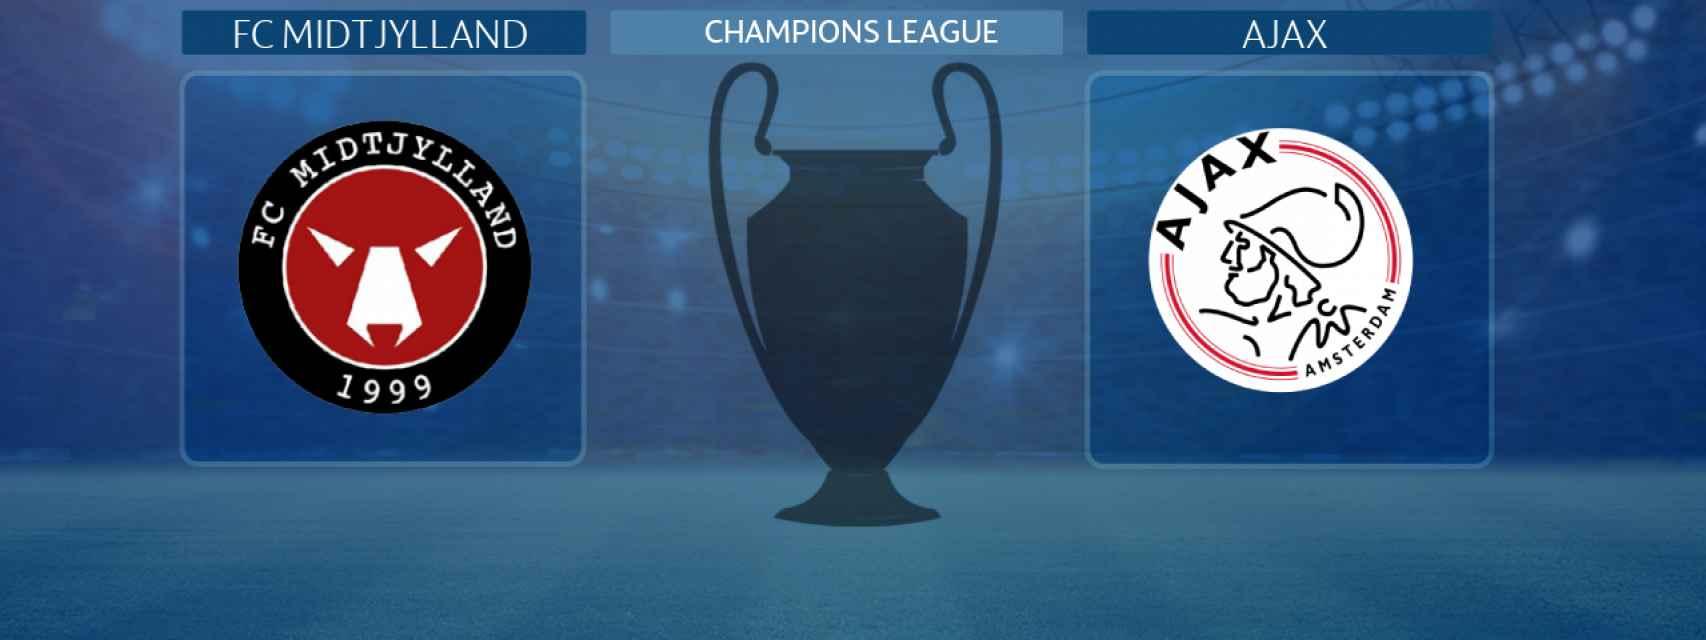 FC Midtjylland - Ajax, partido de la Champions League